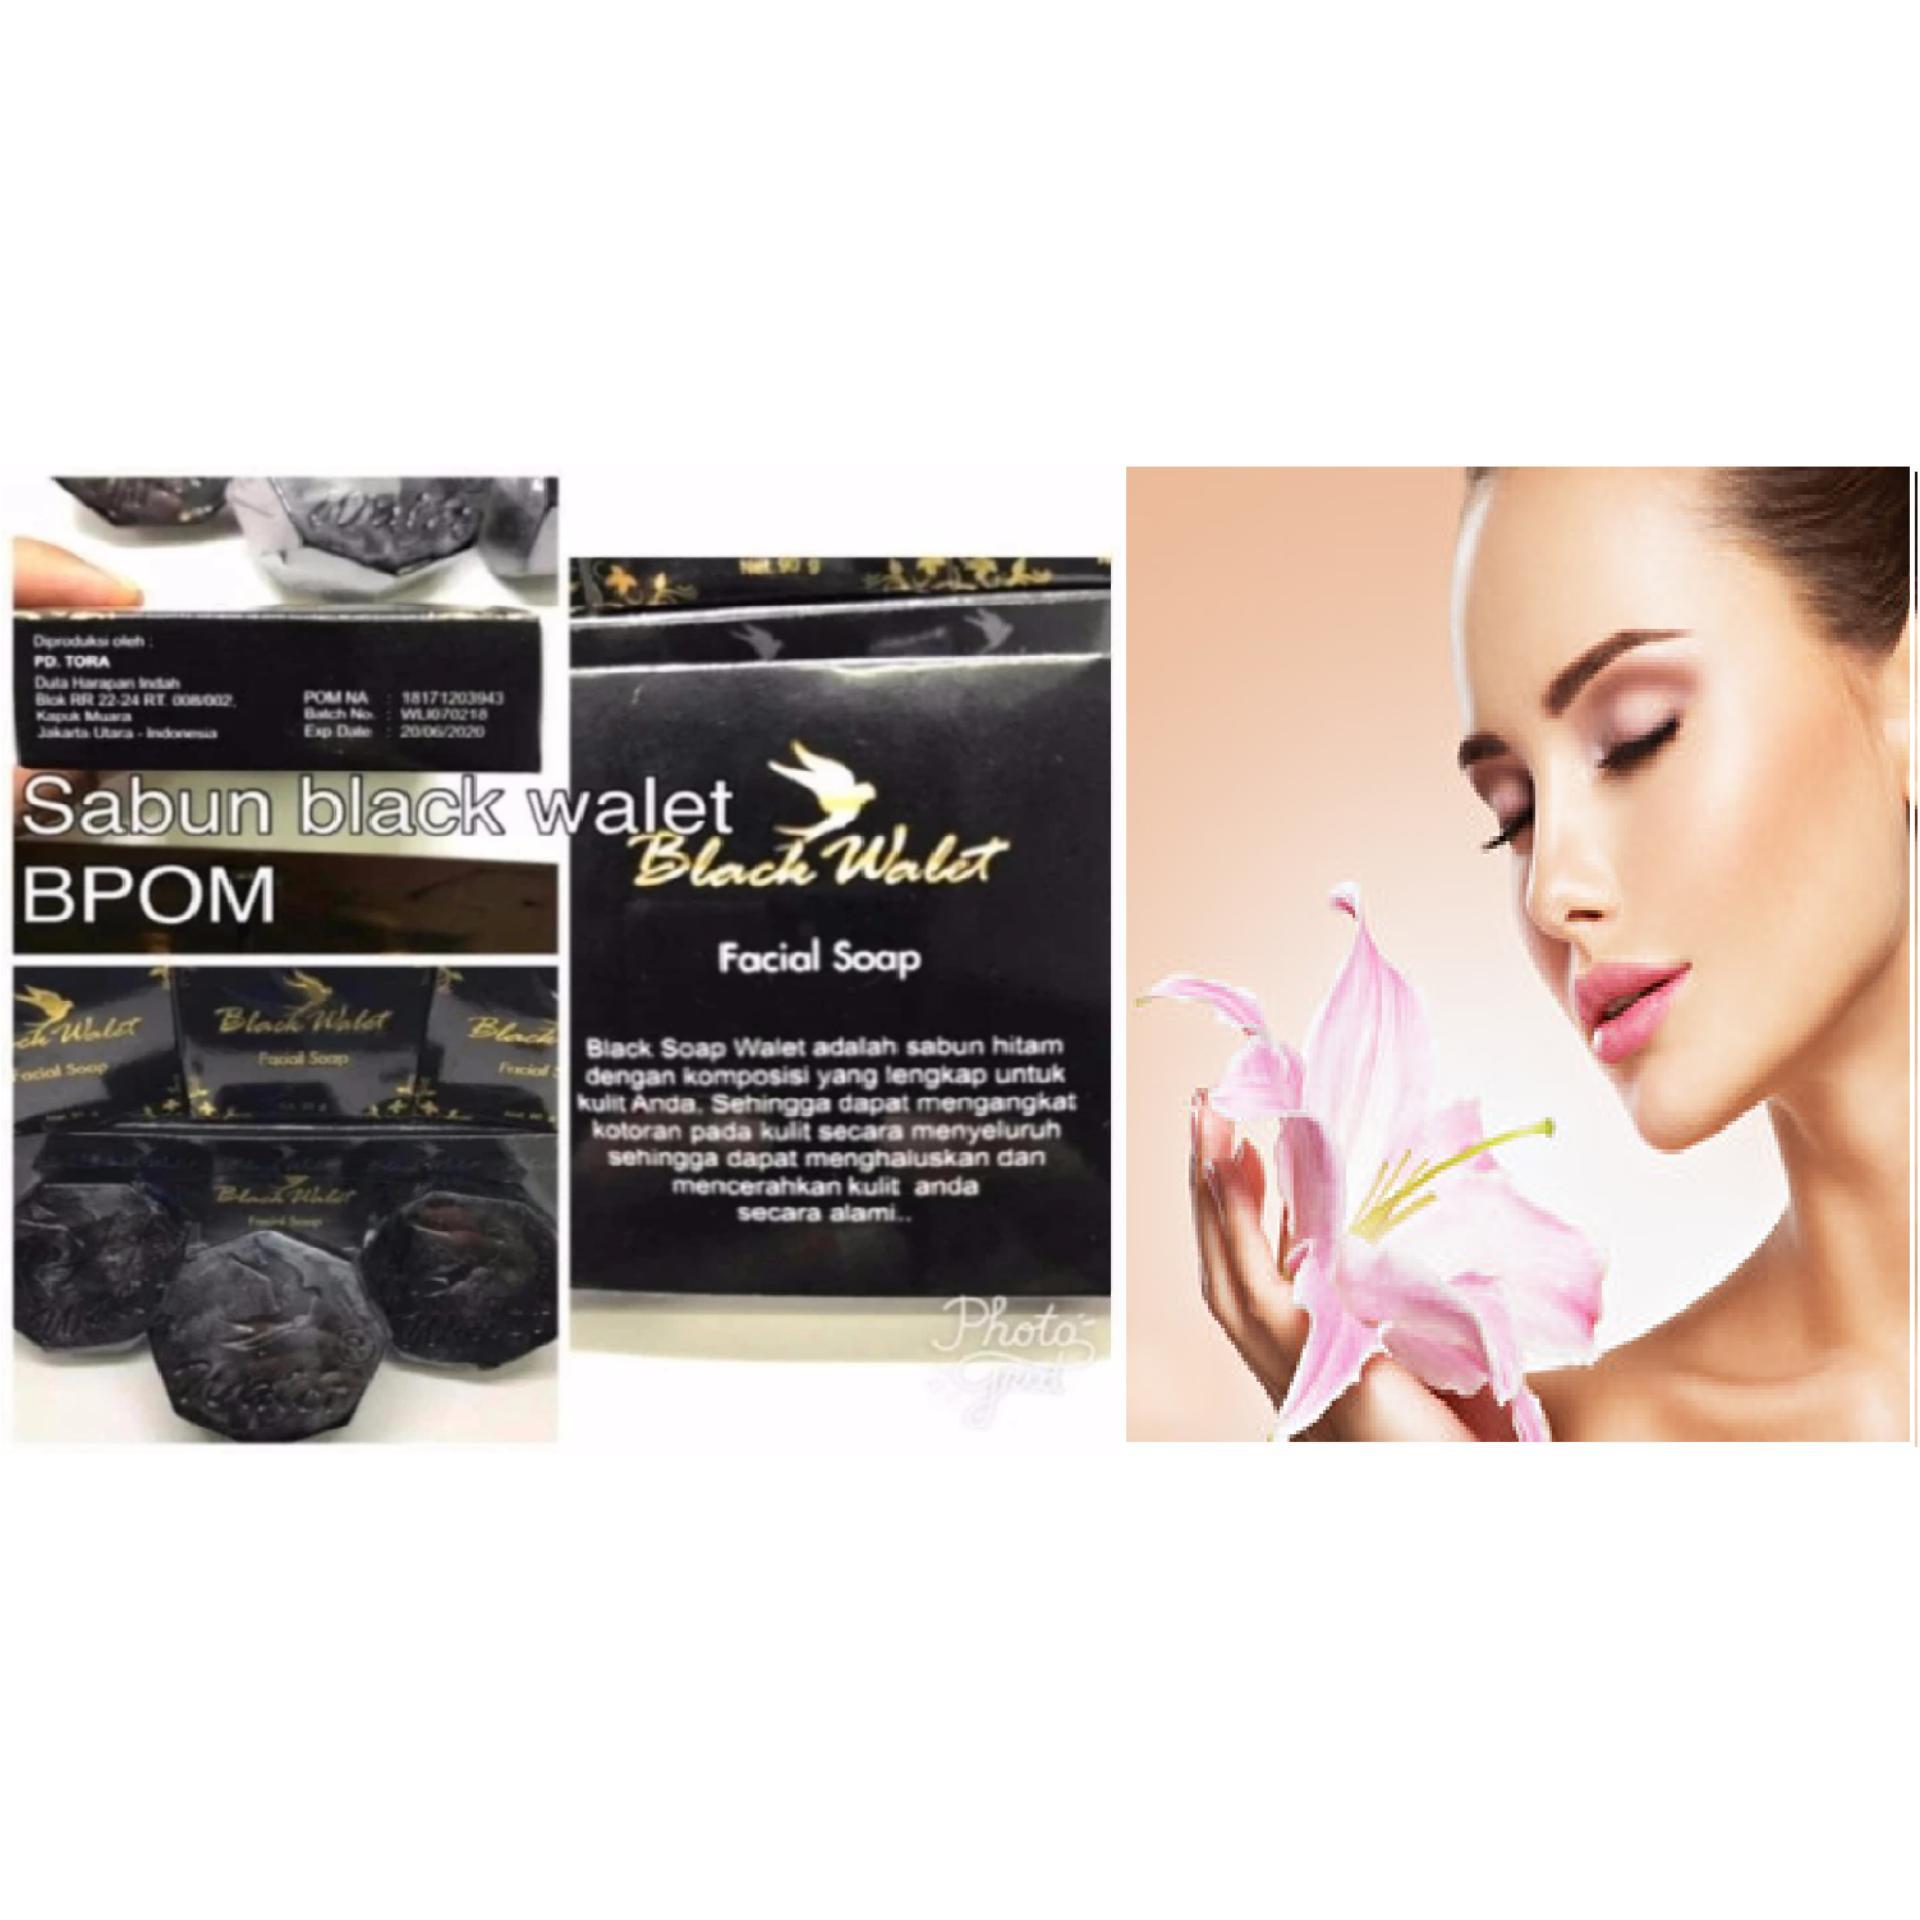 Sabun Walet Black Soap Hitam Satuan 1pcs Update Original Bpom Facial Shop Pembersih Wajah Alami Mascara Helper Alat Bantu Maskara